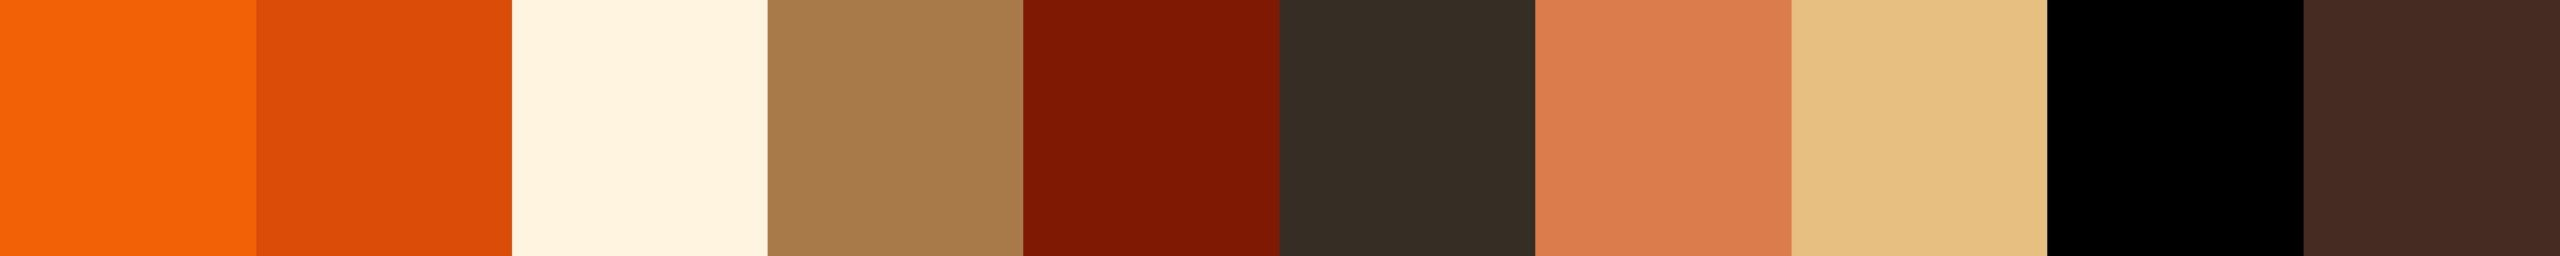 491 Krakatoria Color Palette